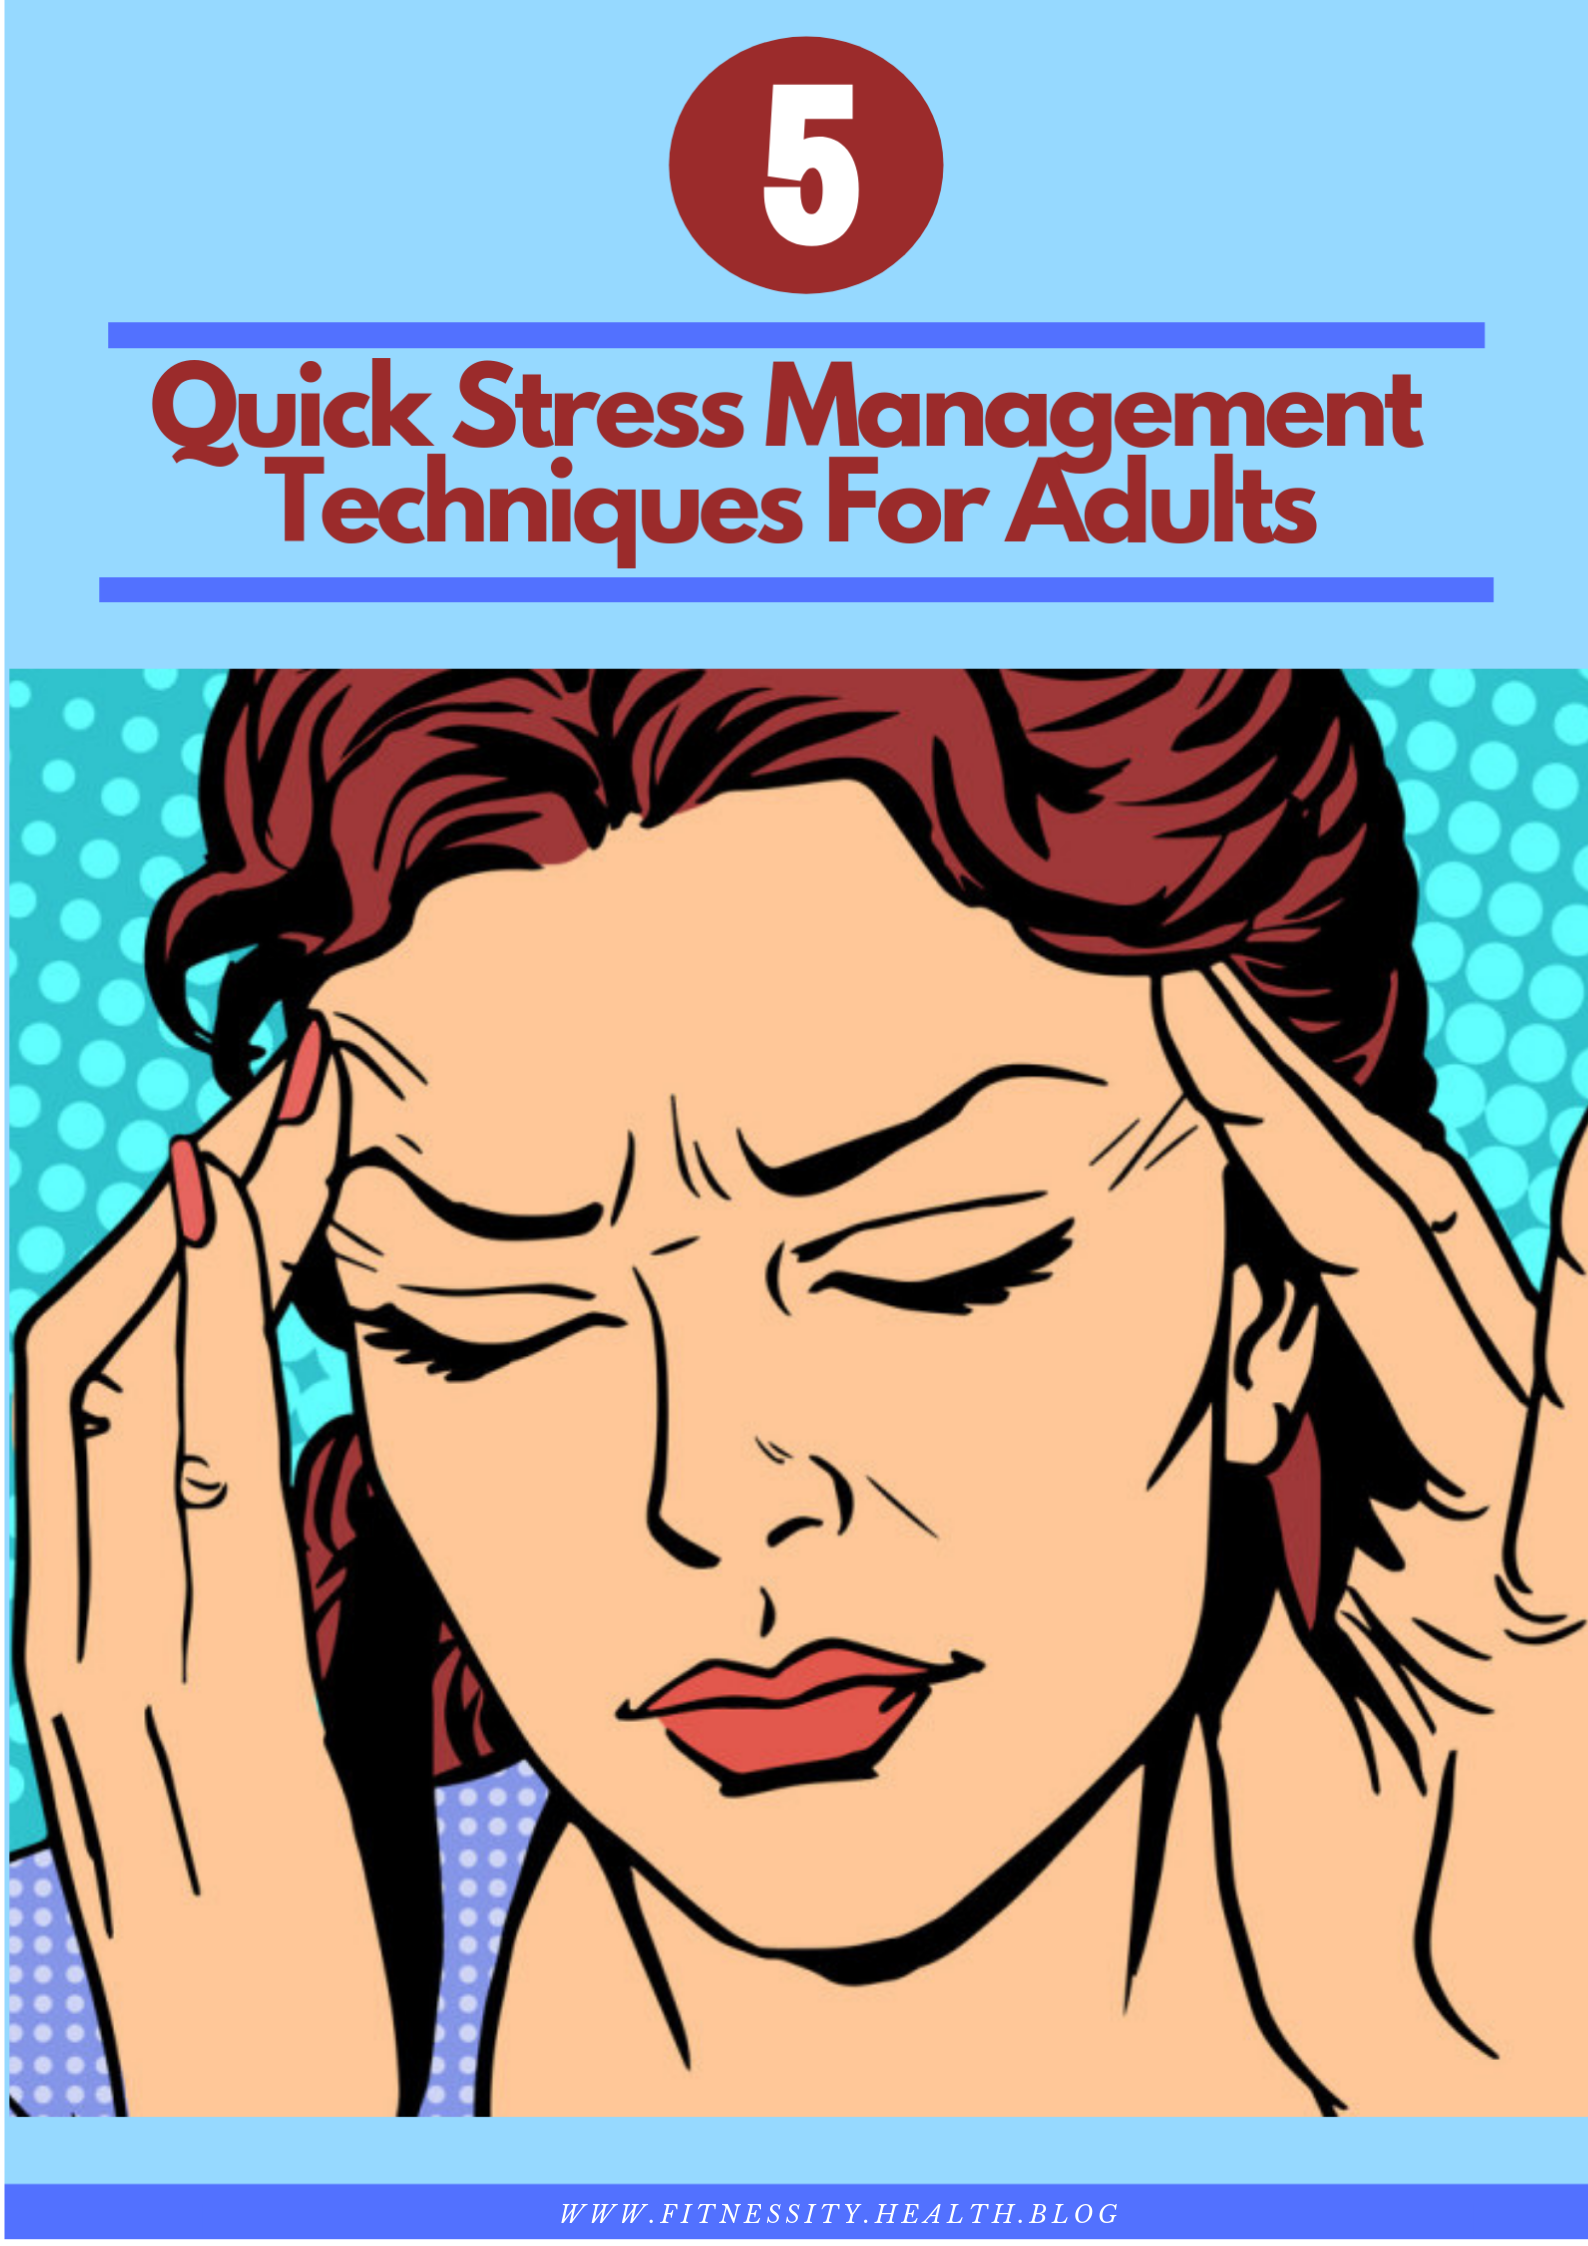 5 Quick Stress Management Techniques For Adults